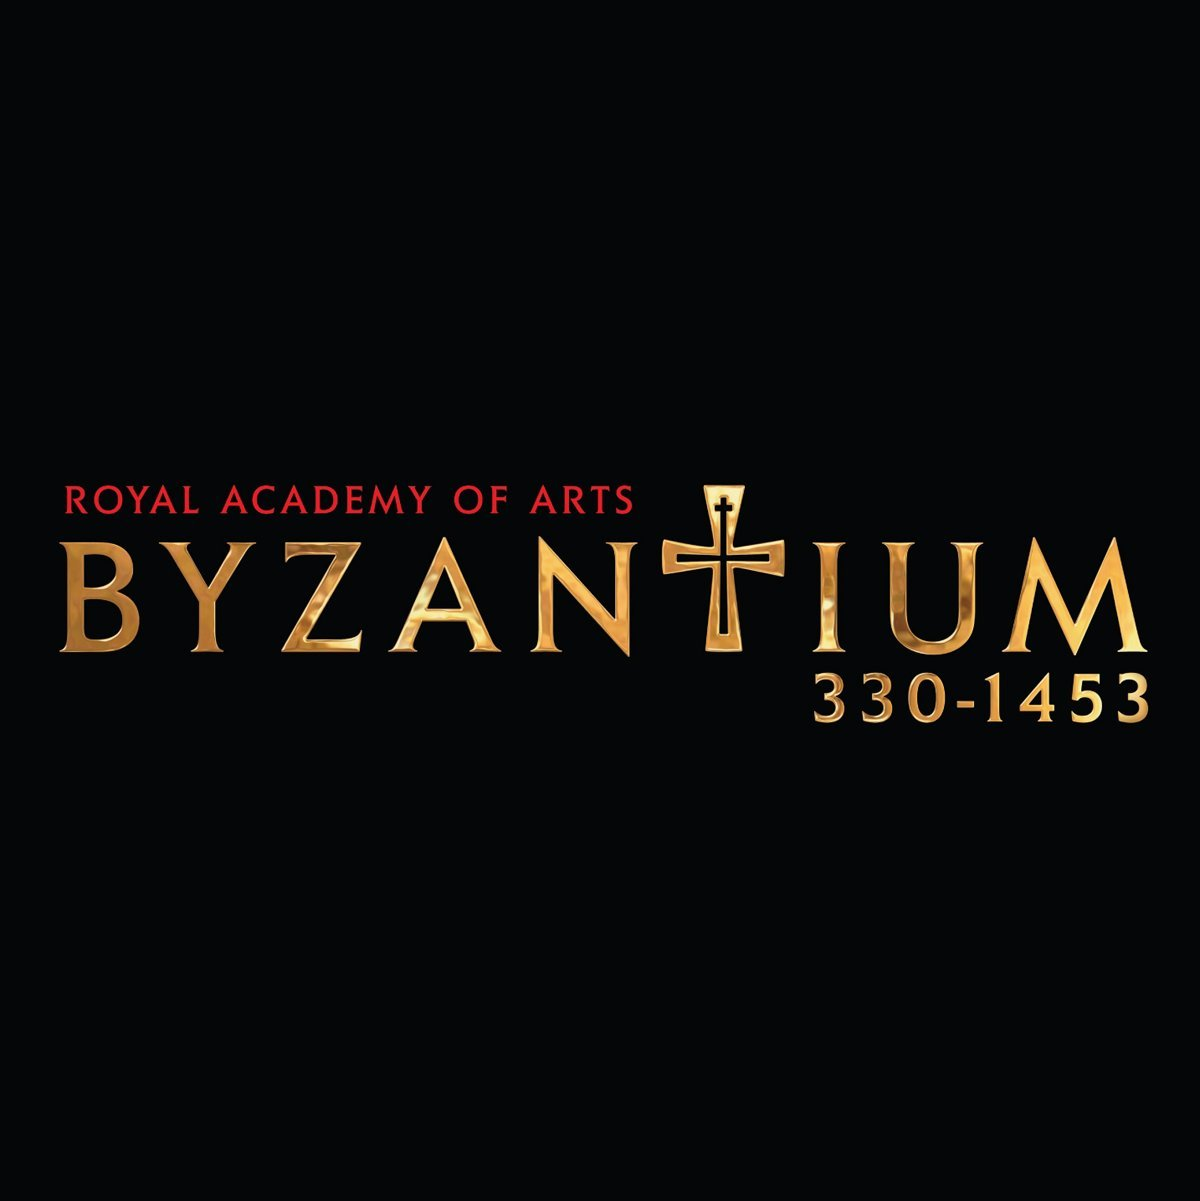 Byzantium: 330-1453 by Cappella Romana